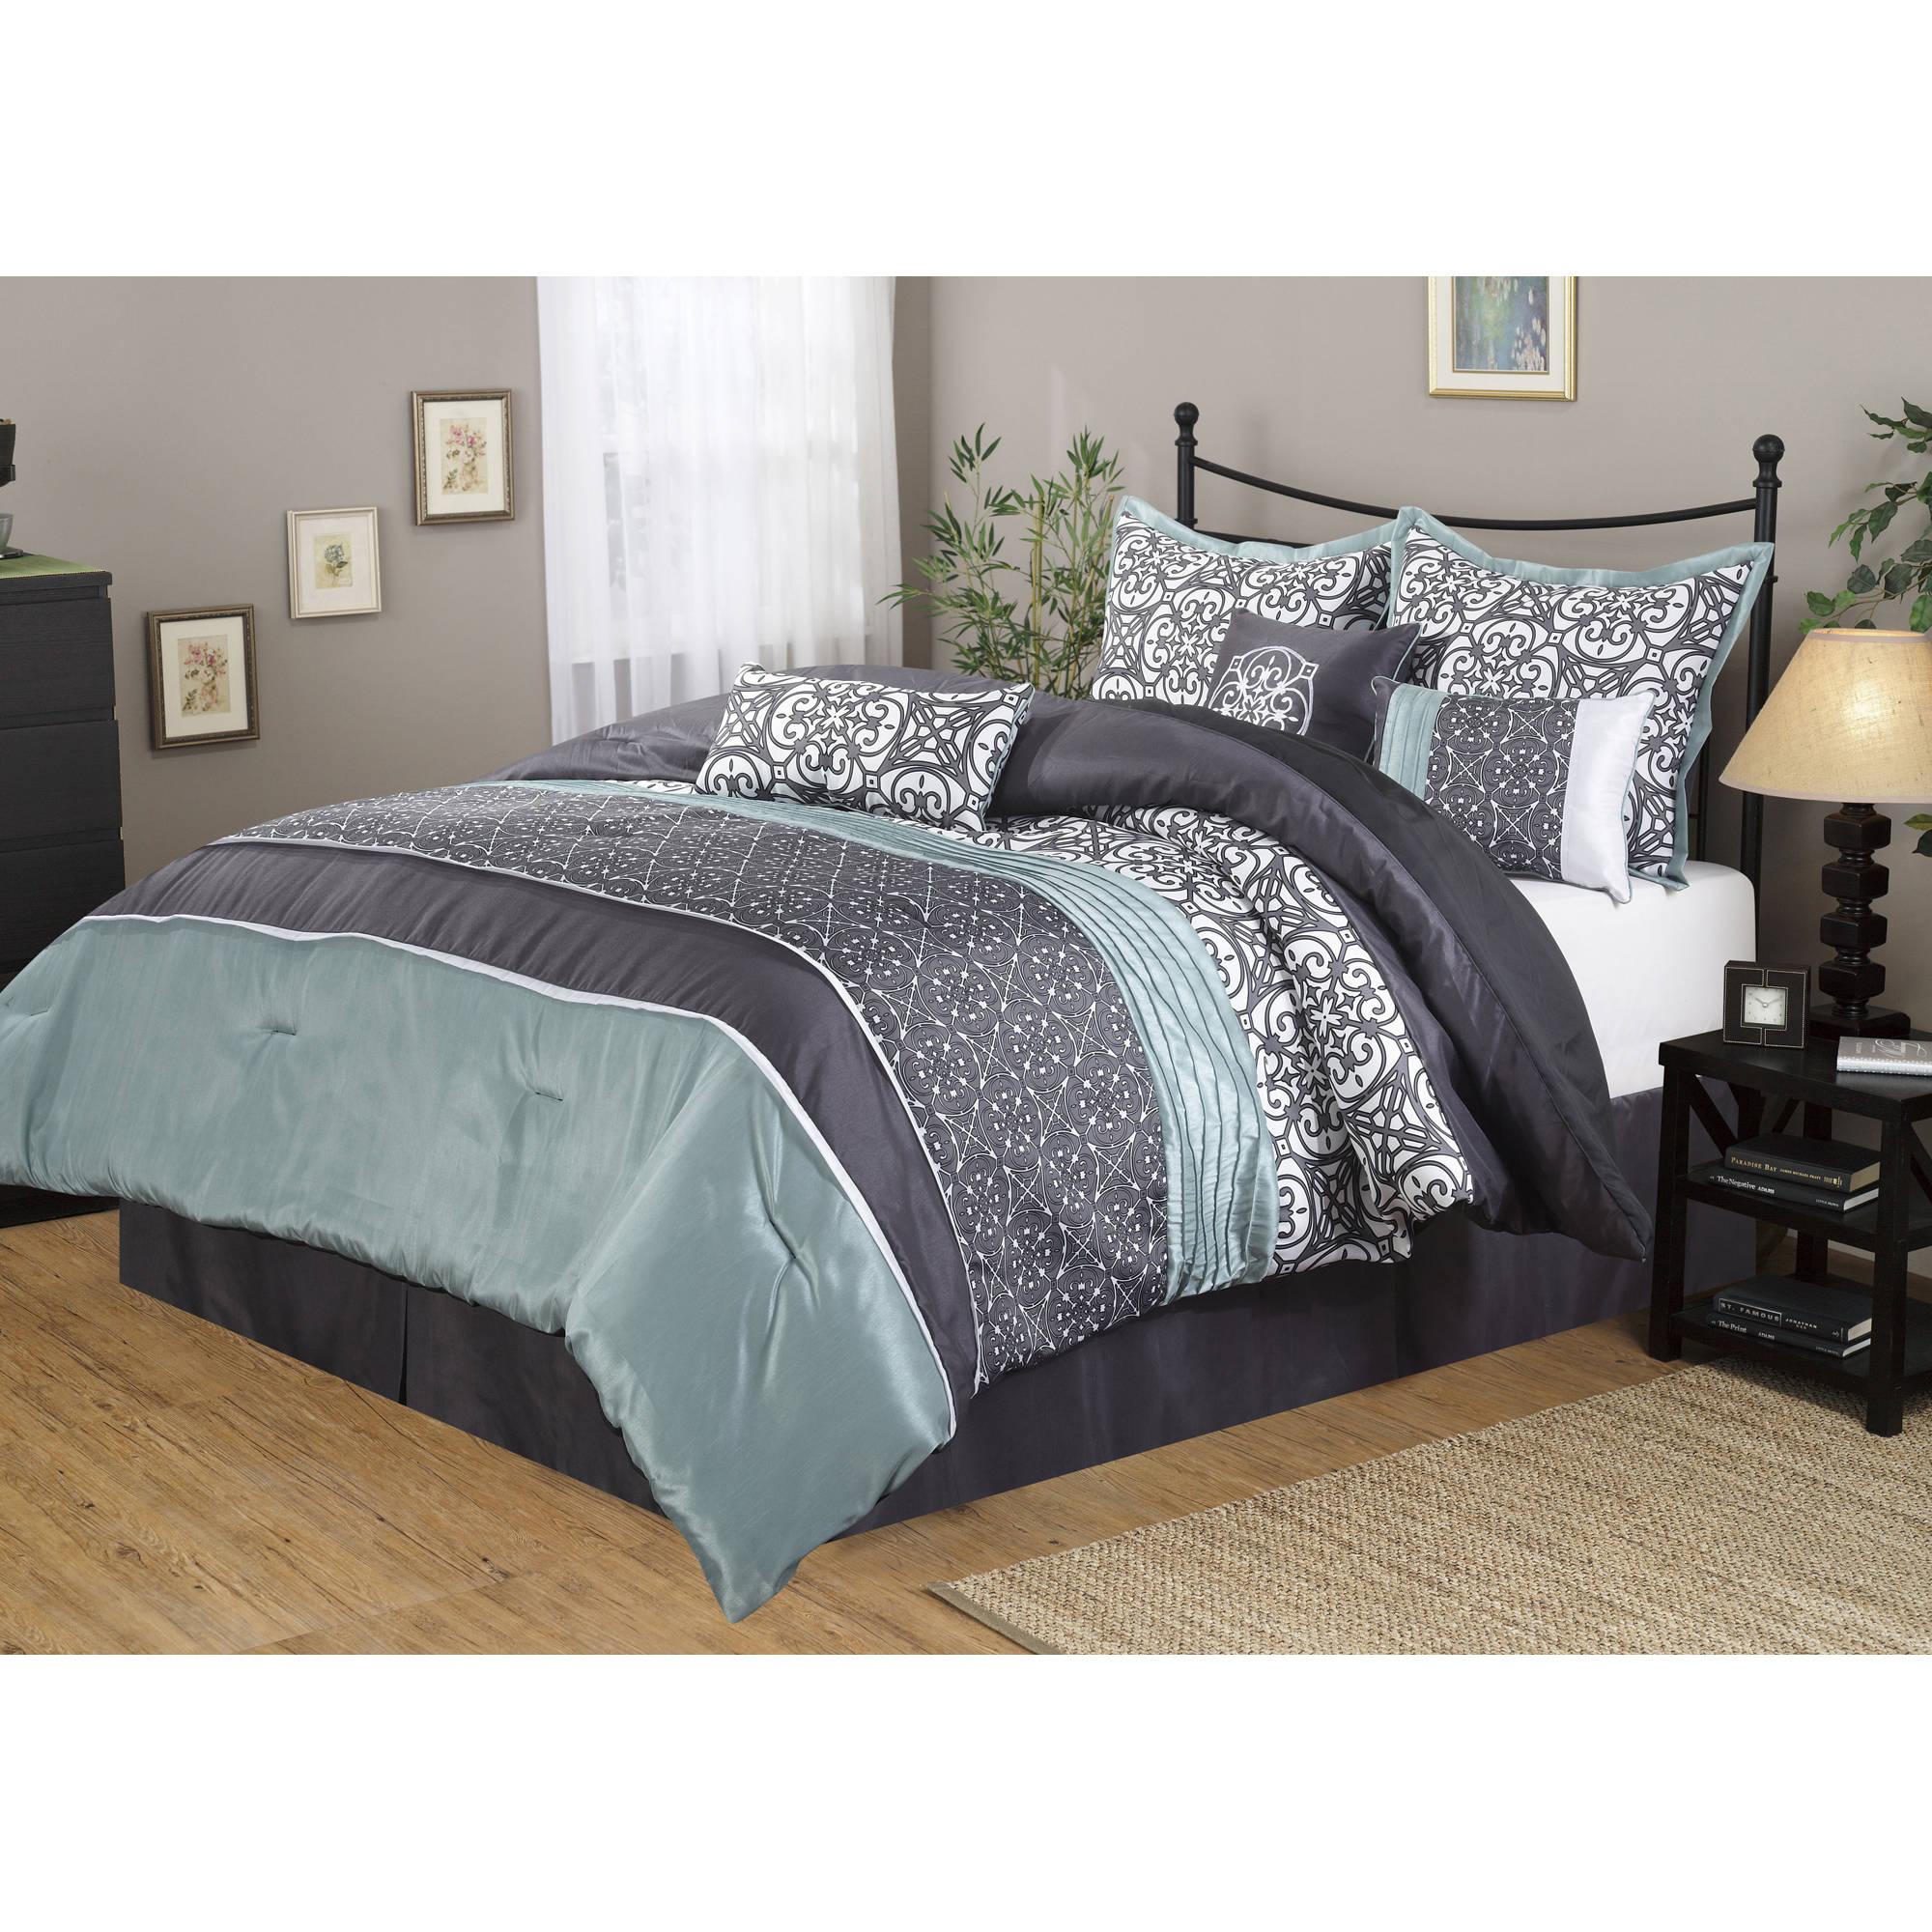 Wayfair basics wayfair basics 7 piece comforter set amp reviews - Nanshing Roxanne 7 Piece Bedding Comforter Set